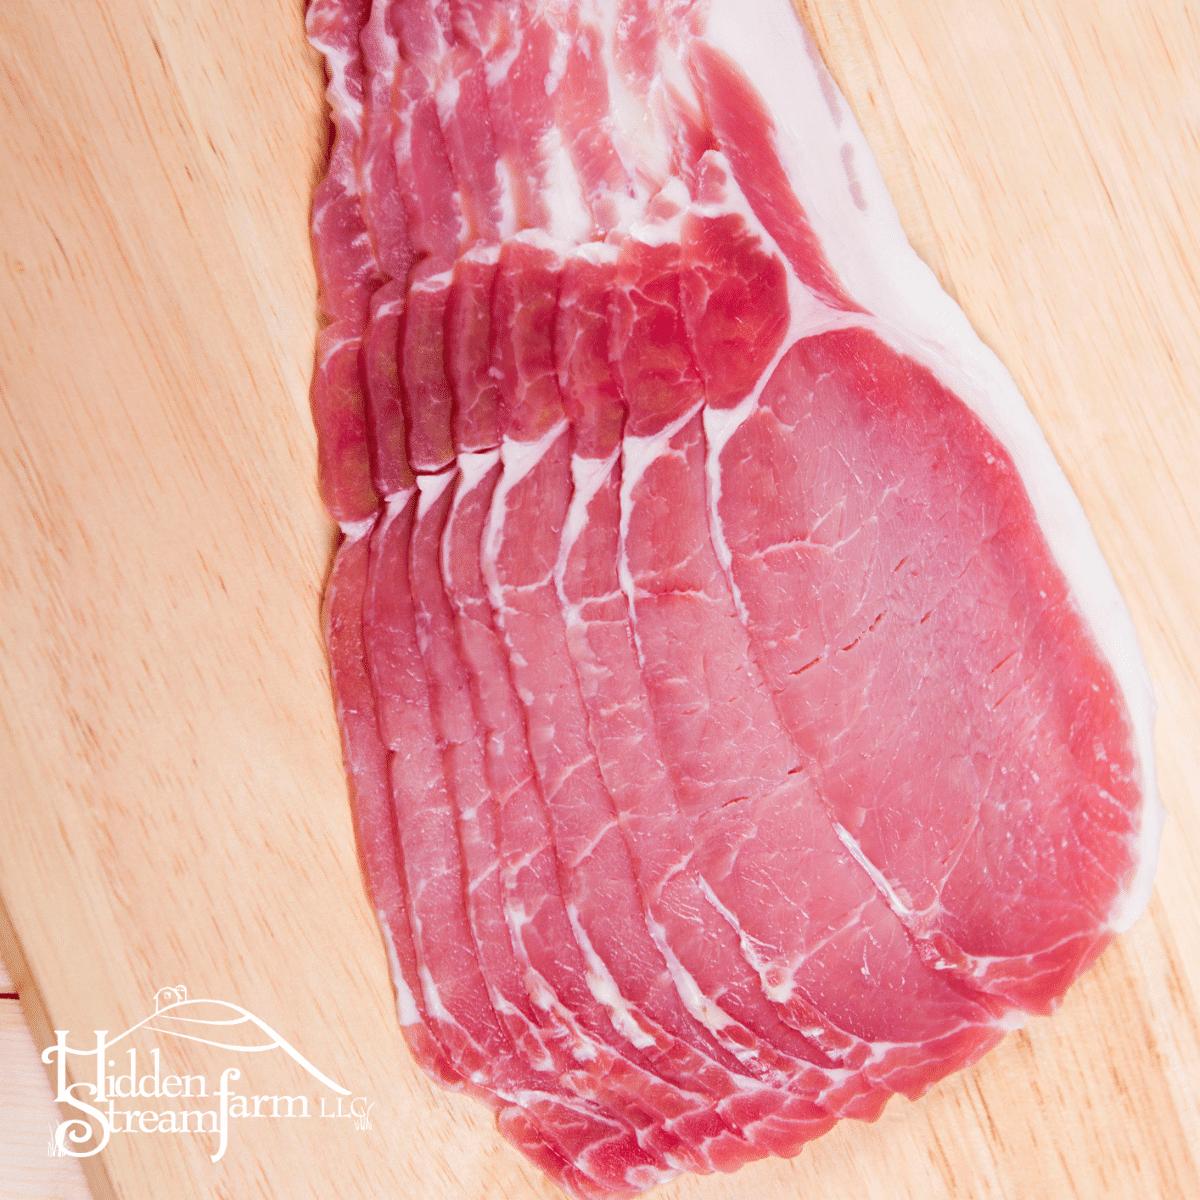 British Bacon, Uncured